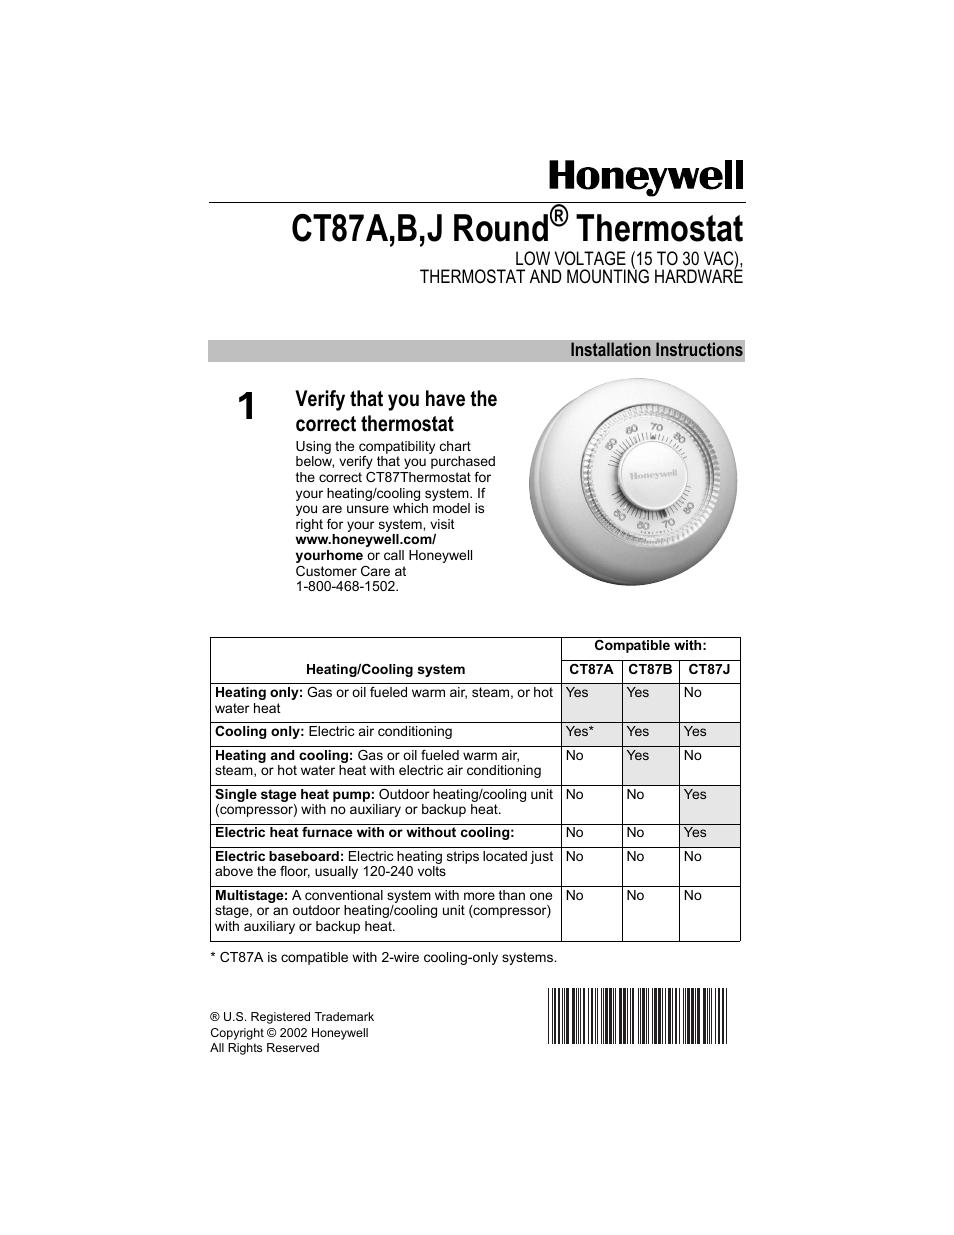 honeywell ct87a user manual